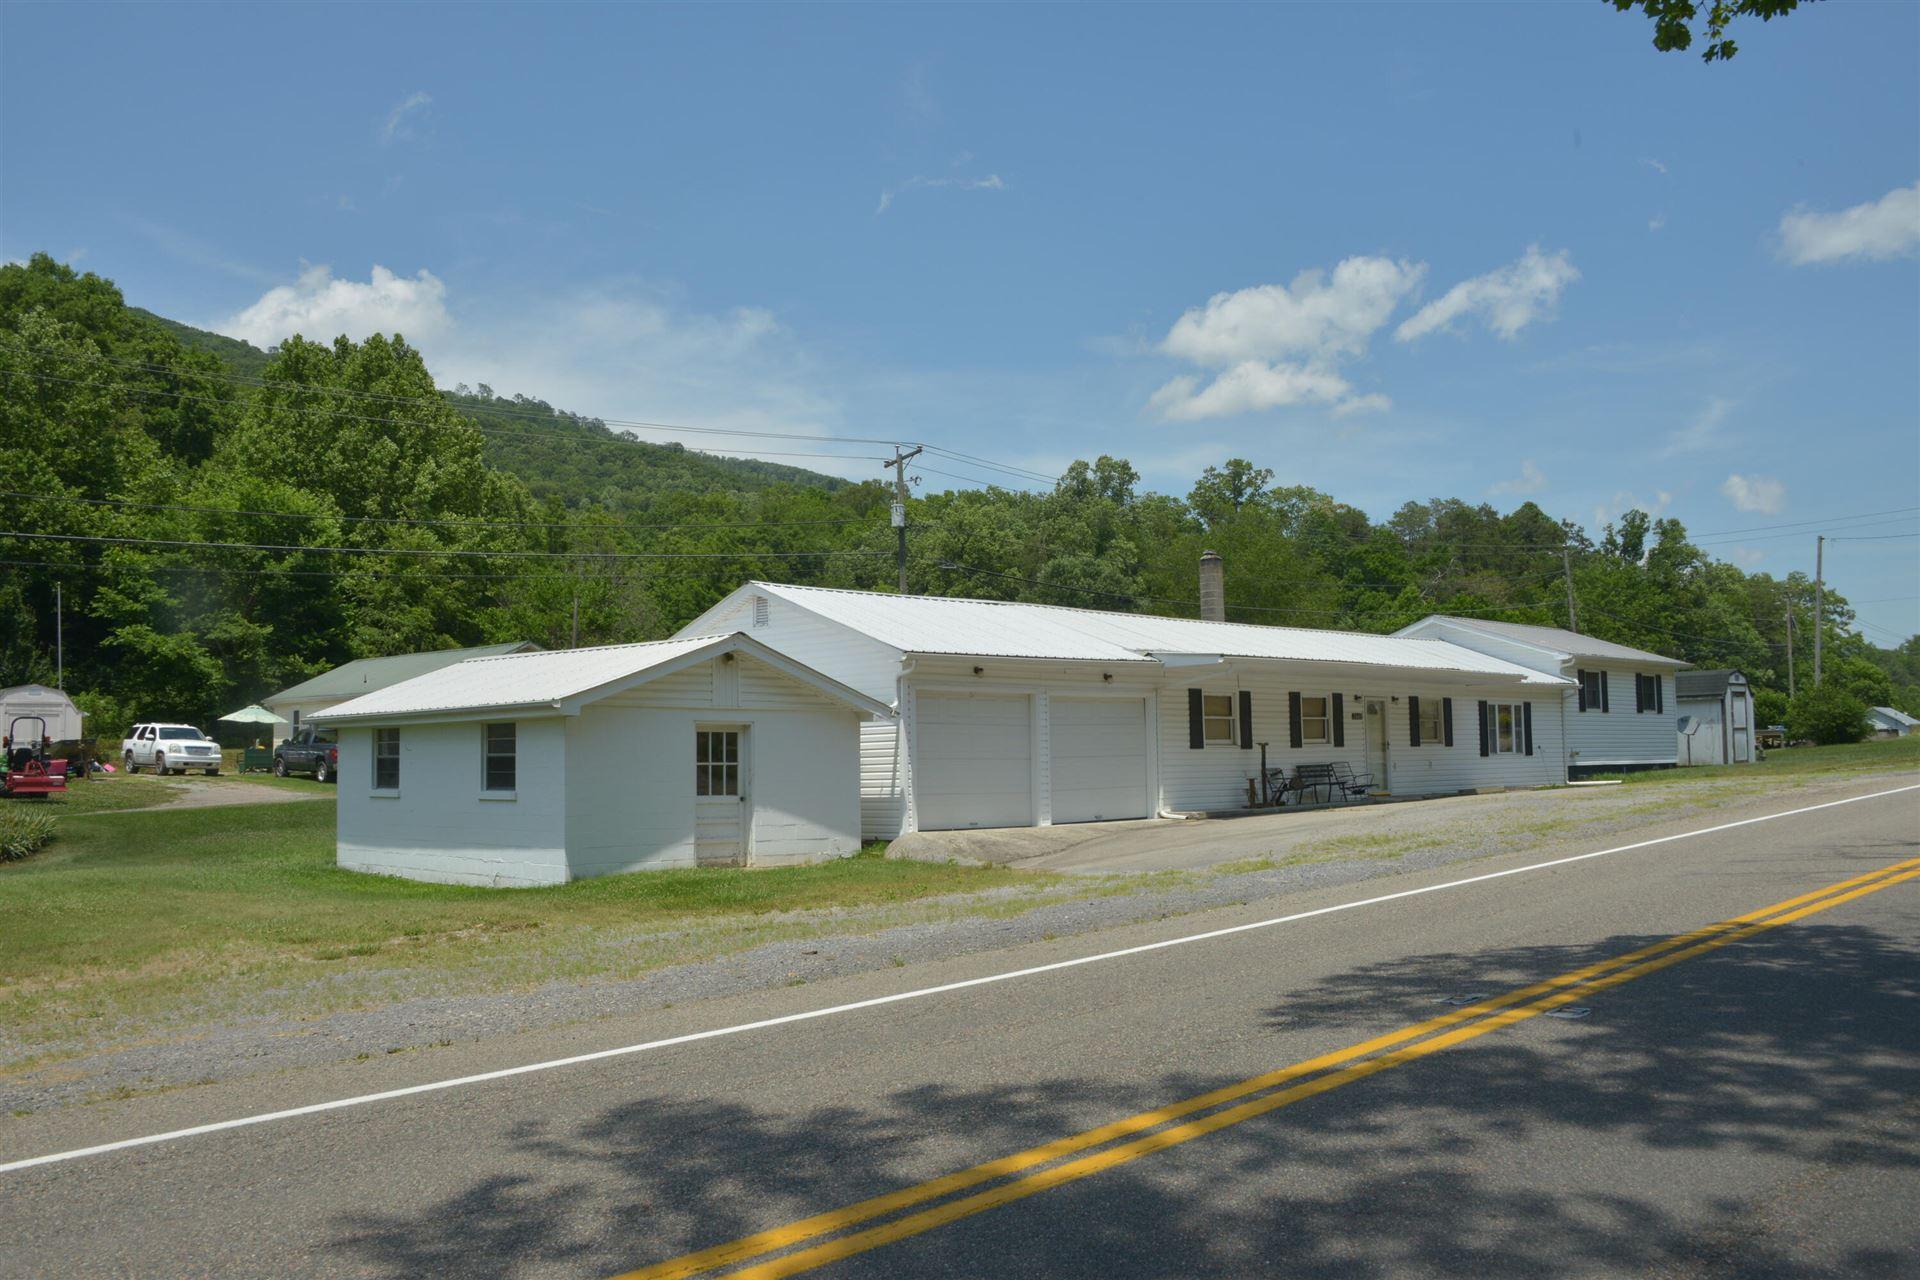 Photo of 2661 Bristol Highway, Gate City, VA 24251 (MLS # 9925227)